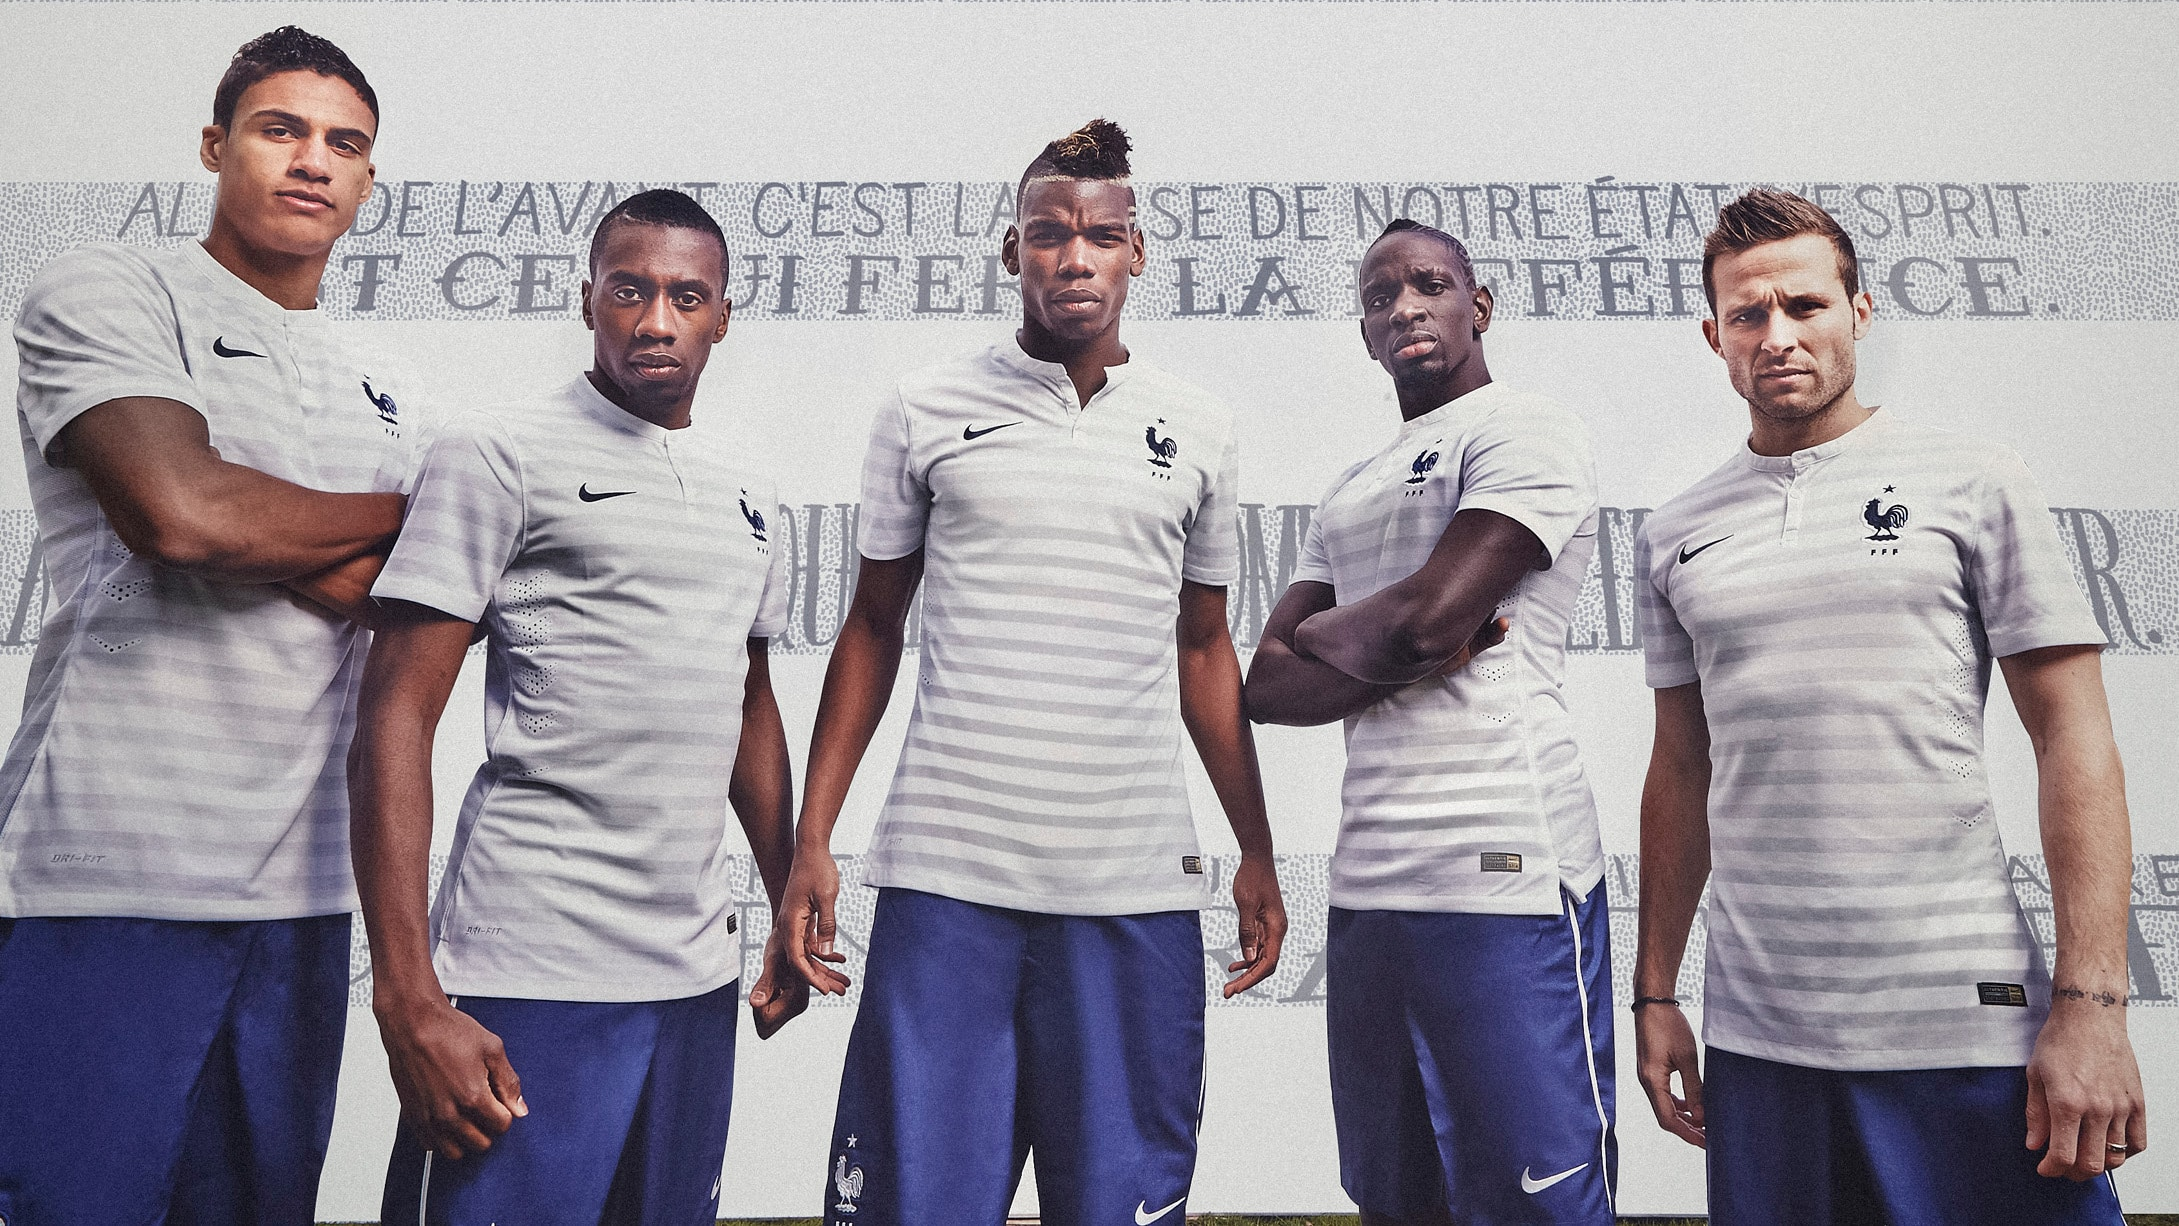 maillot-football-nike-equipe-de-france-exterieur-2014-img1